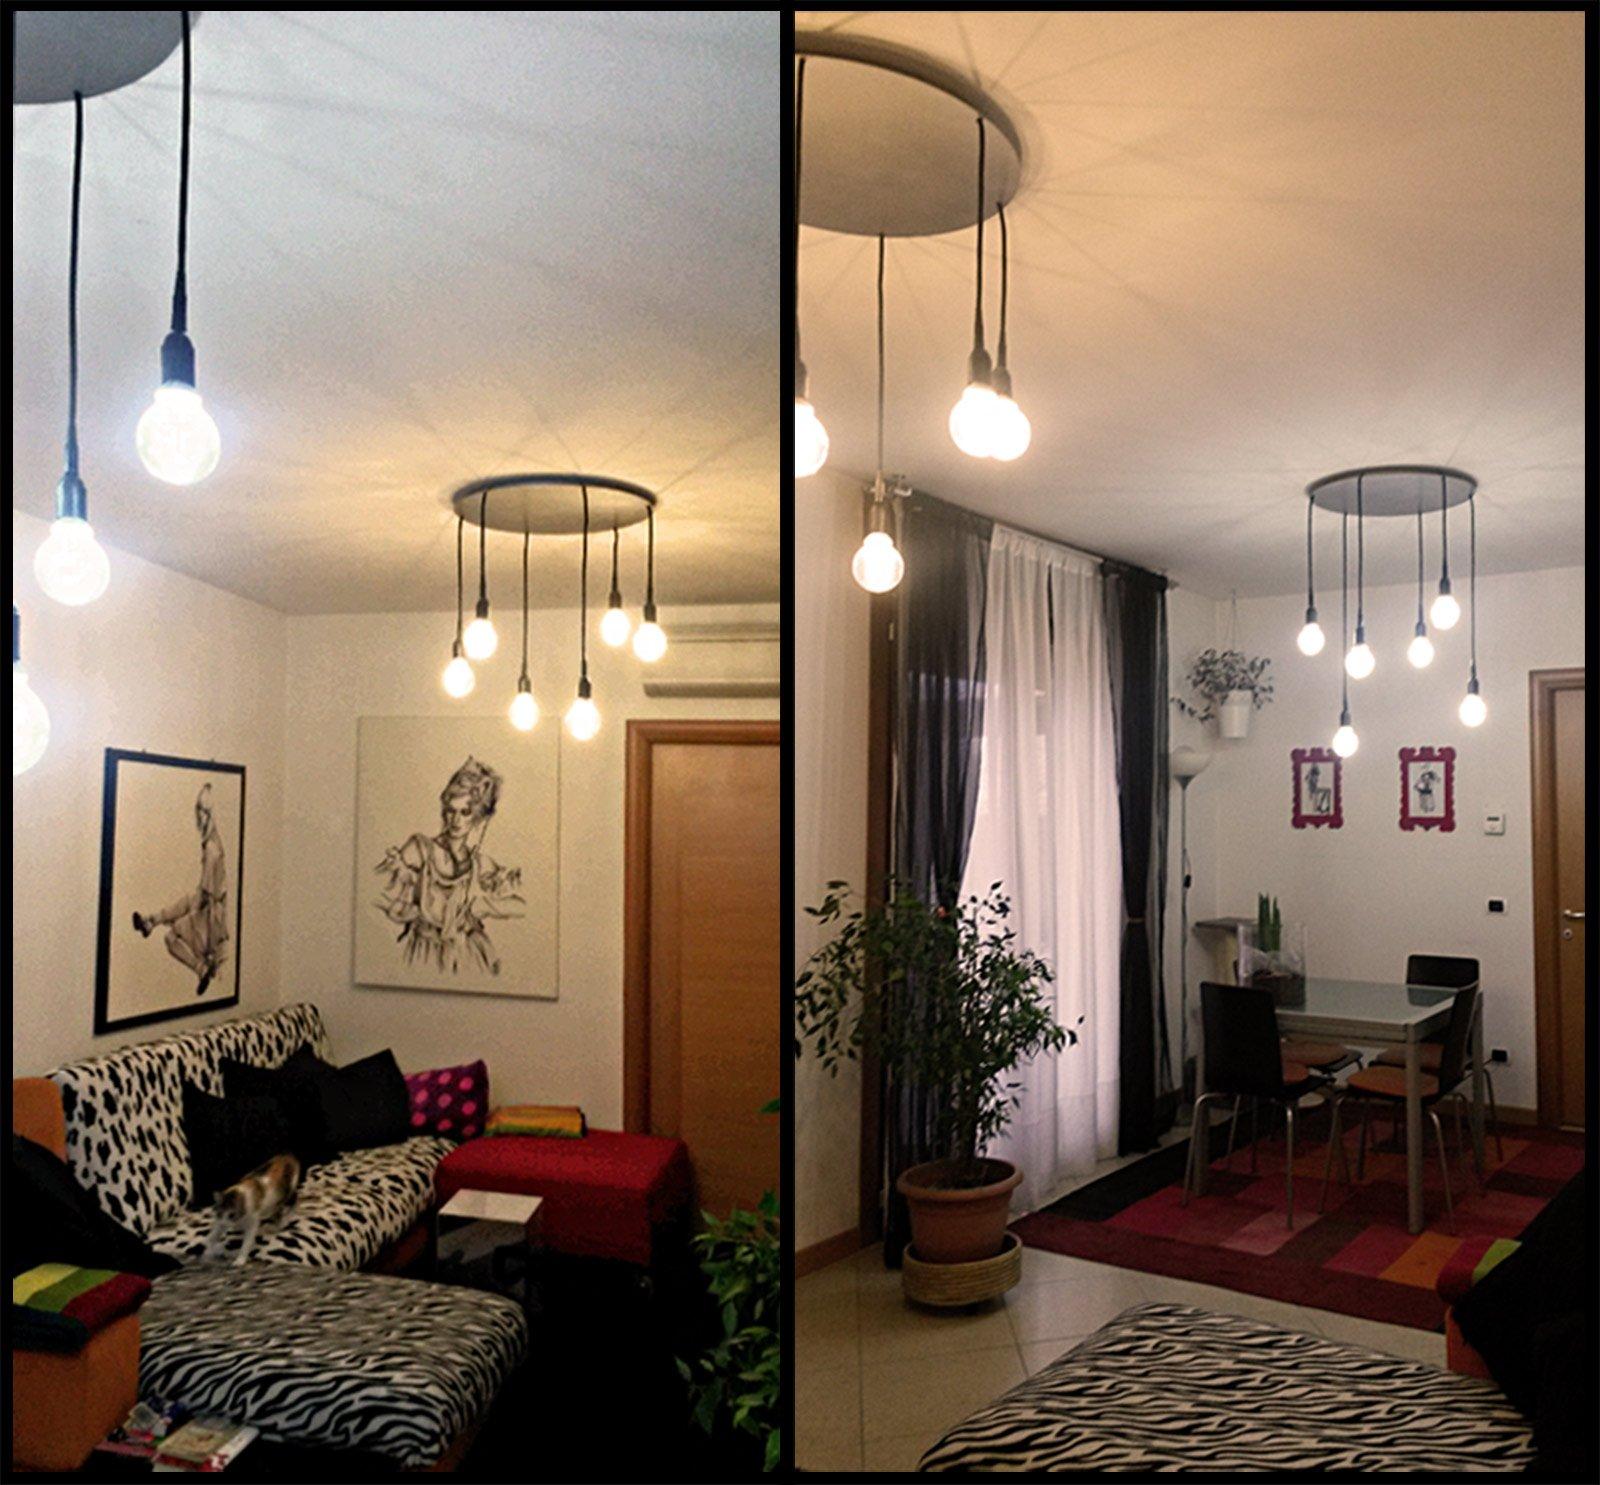 Lampadario a sospensione low cost   Cose di Casa -> Lampadari Moderni Per Mansarde